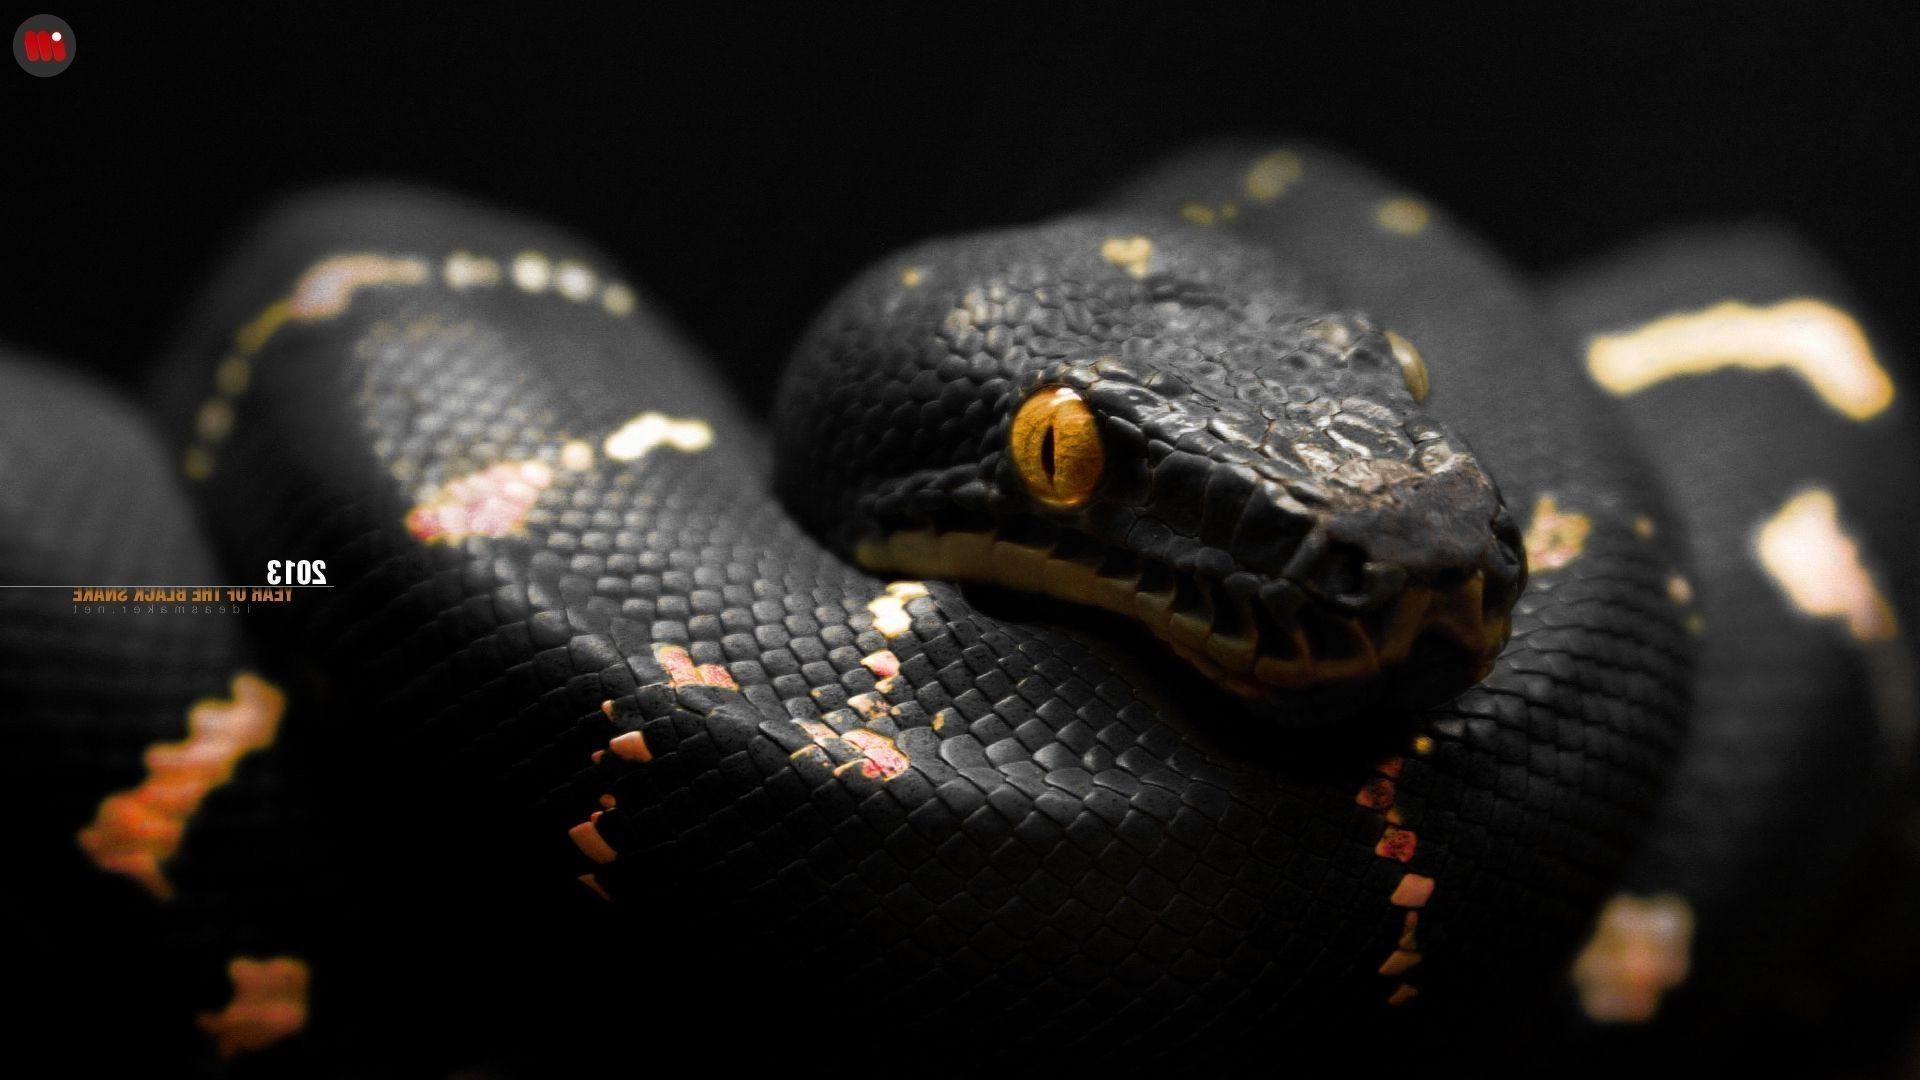 Res: 1920x1080, eyes snake black orange reptiles wallpaper and background